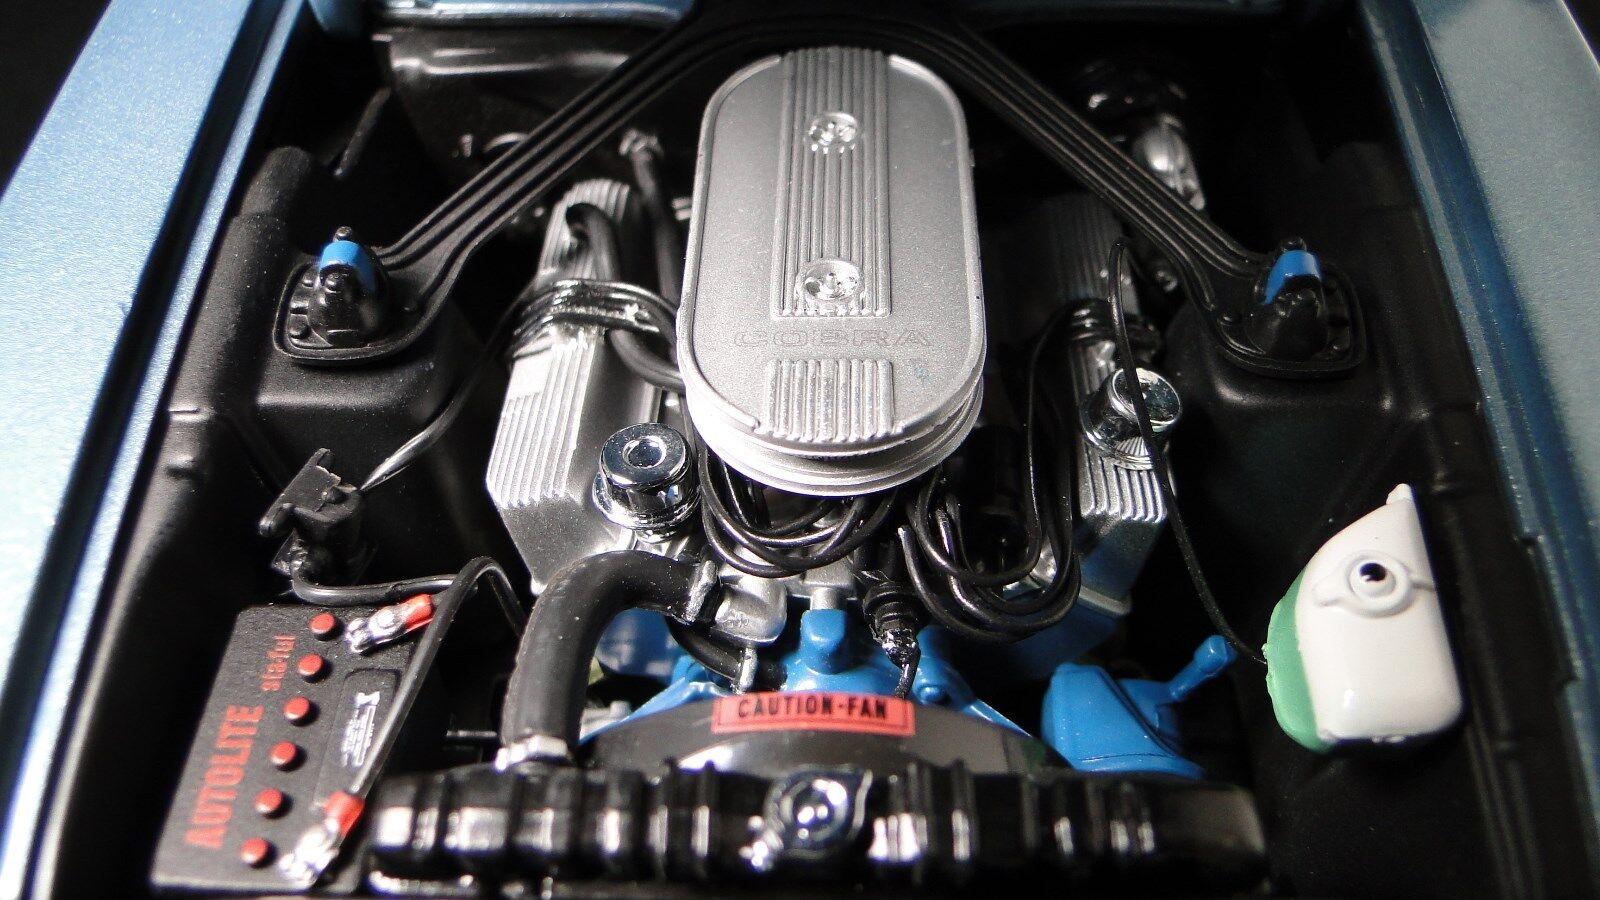 1967 Mustang Ford GT Pro Street Mod Race Car Drag Hot Rod 1 18 Carousel blu 24